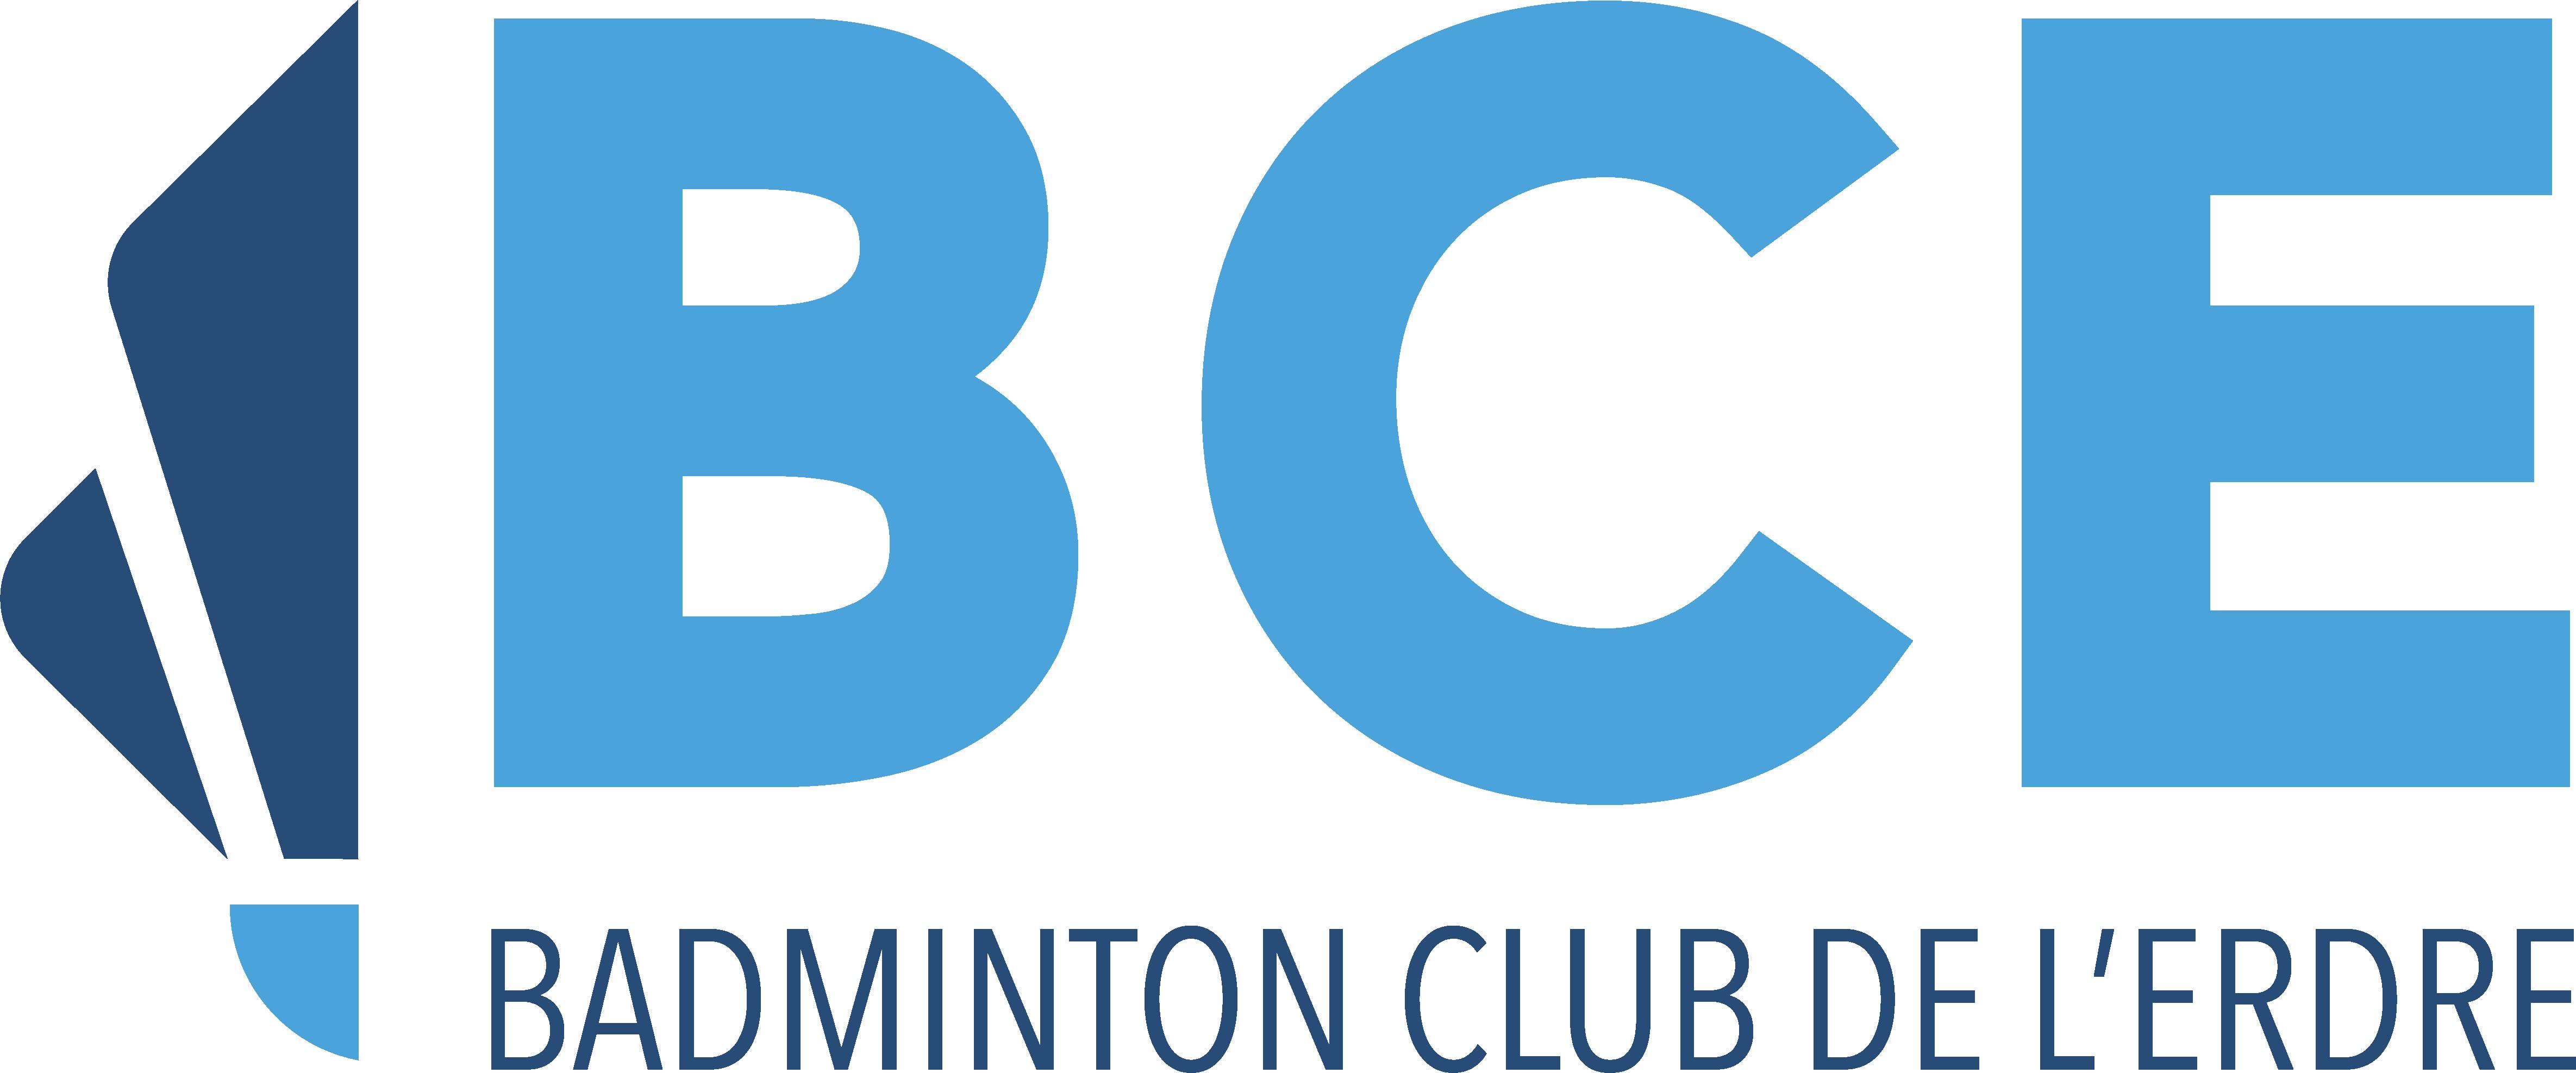 bce44